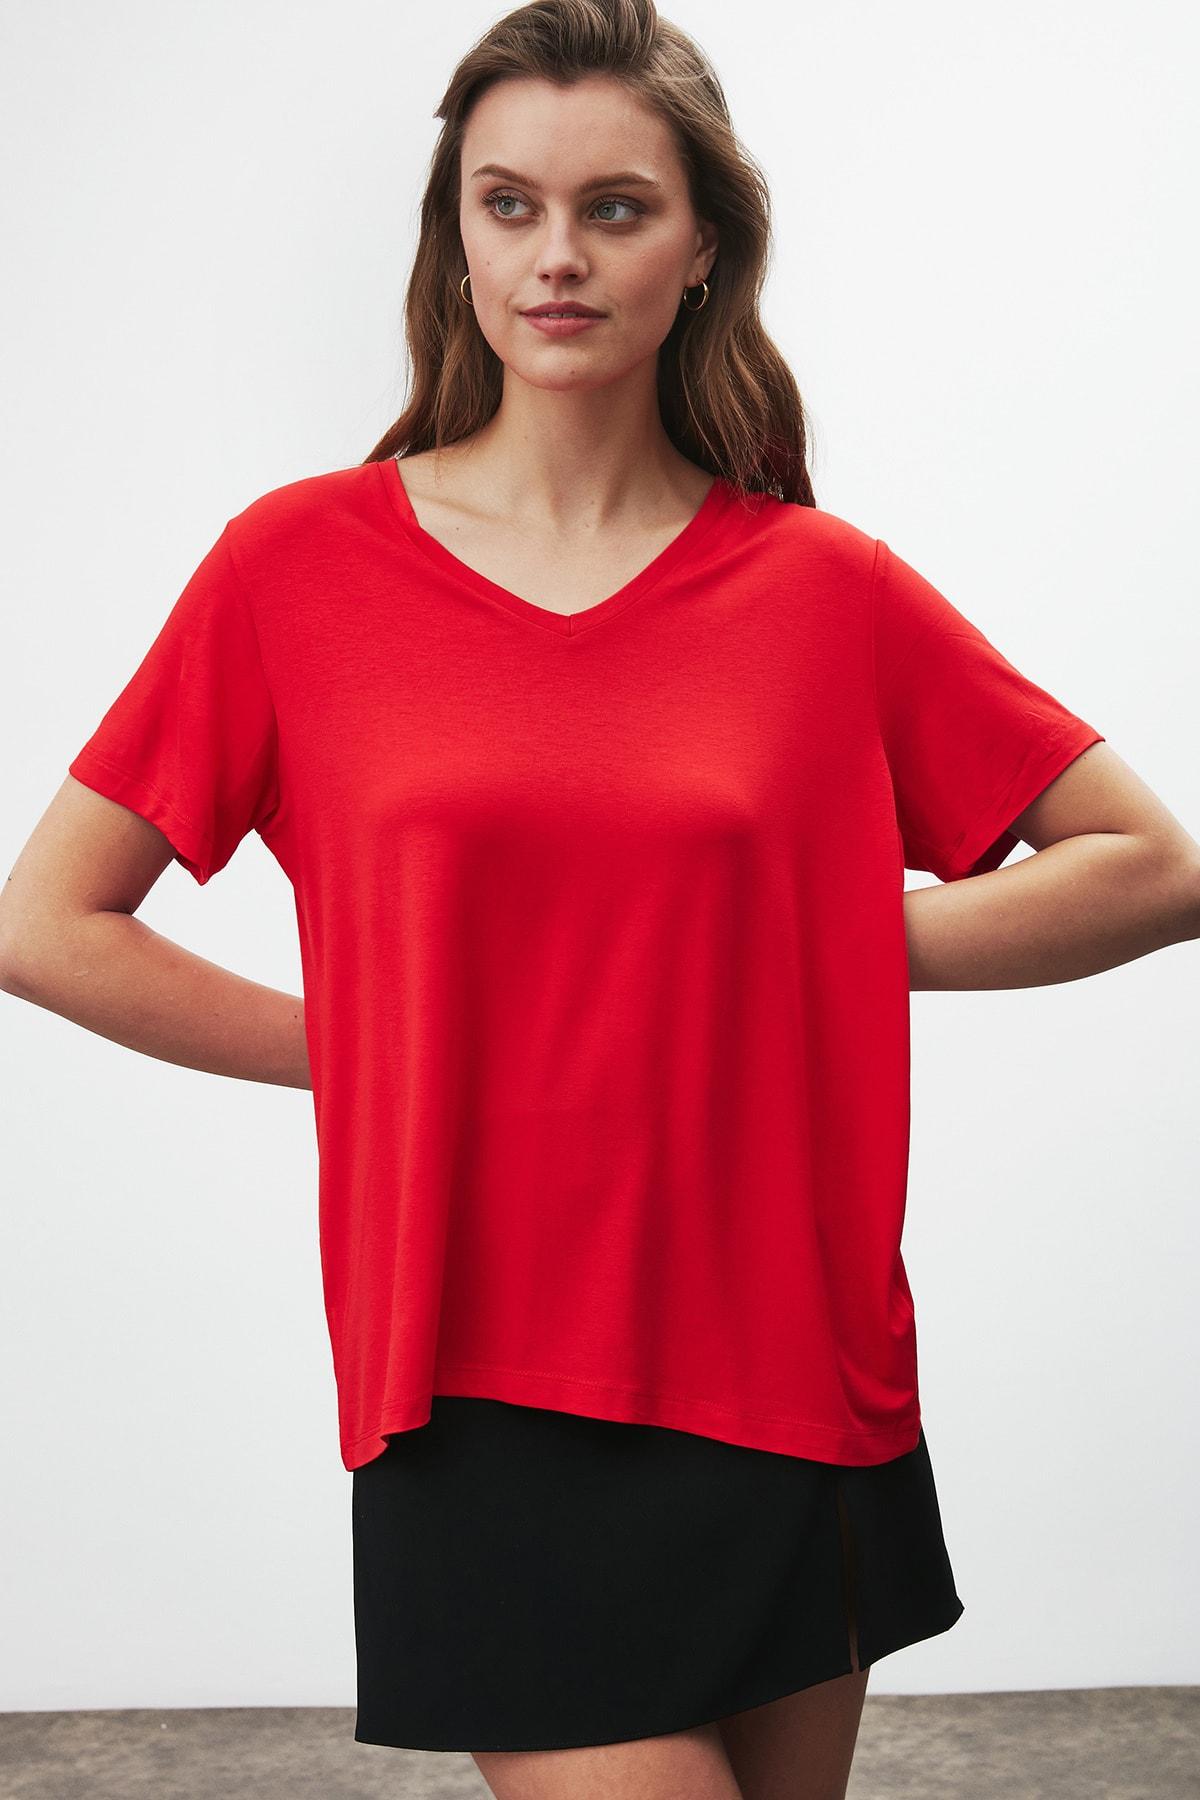 GRIMELANGE Vıolet Kadın Kırmızı Comfort Fit V Yaka Kısa Kollu T-shirt 1